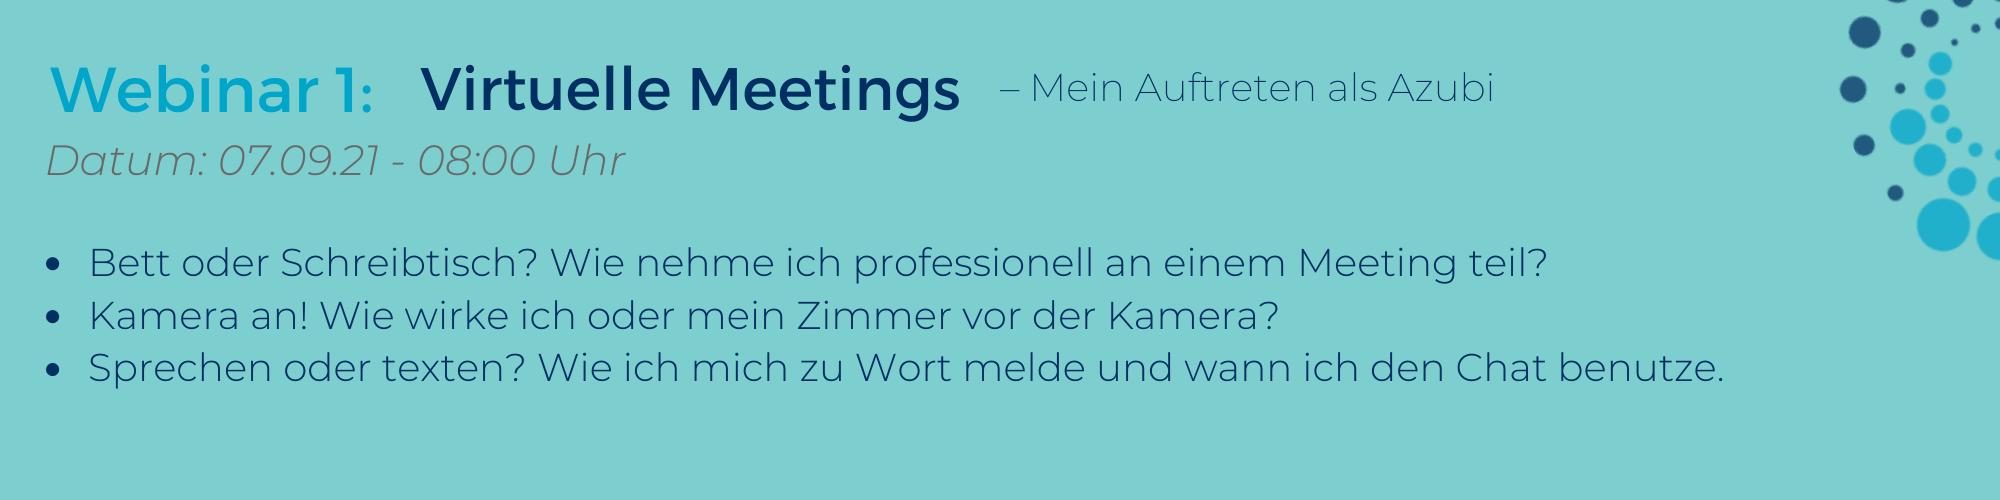 Webinar: Azubi-Webinar-Reihe Virtuelle Meetings für Azubis